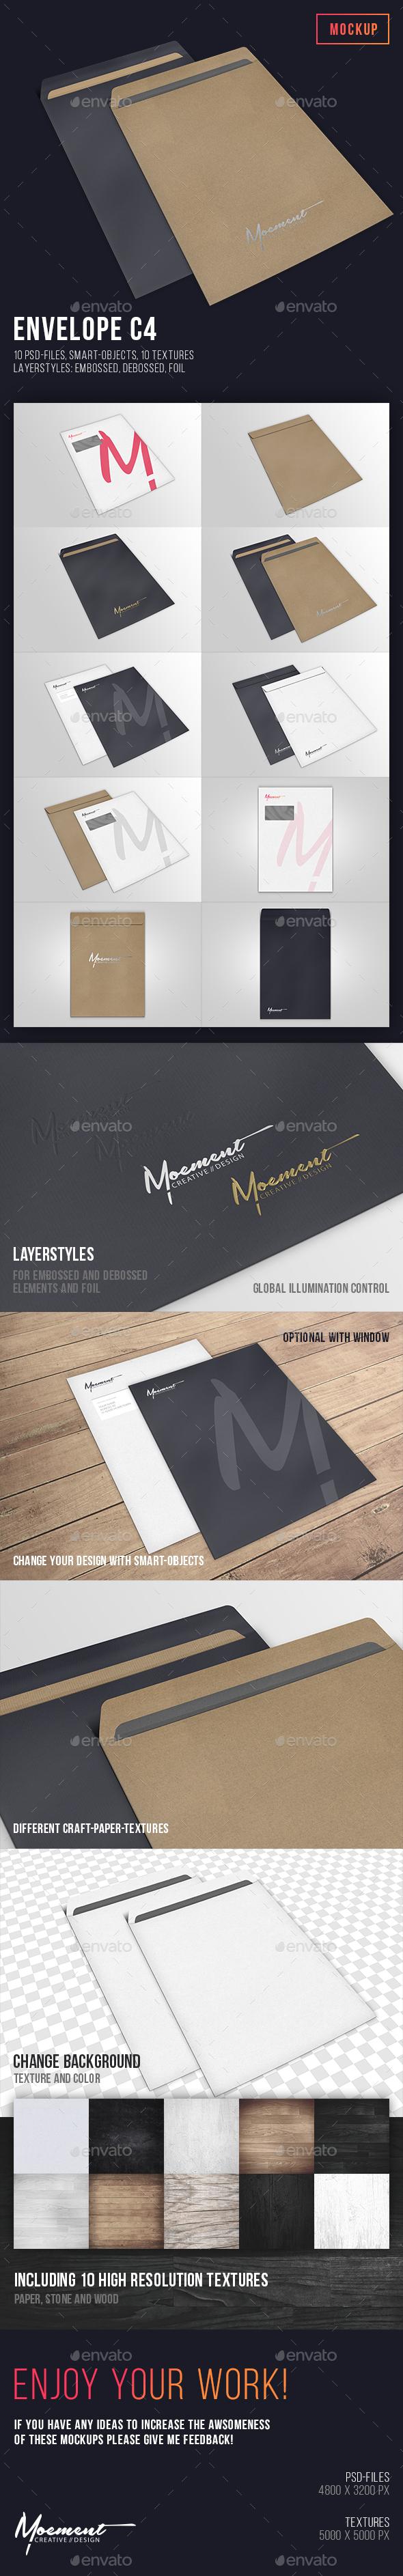 Envelope C4 Mockup - Stationery Print